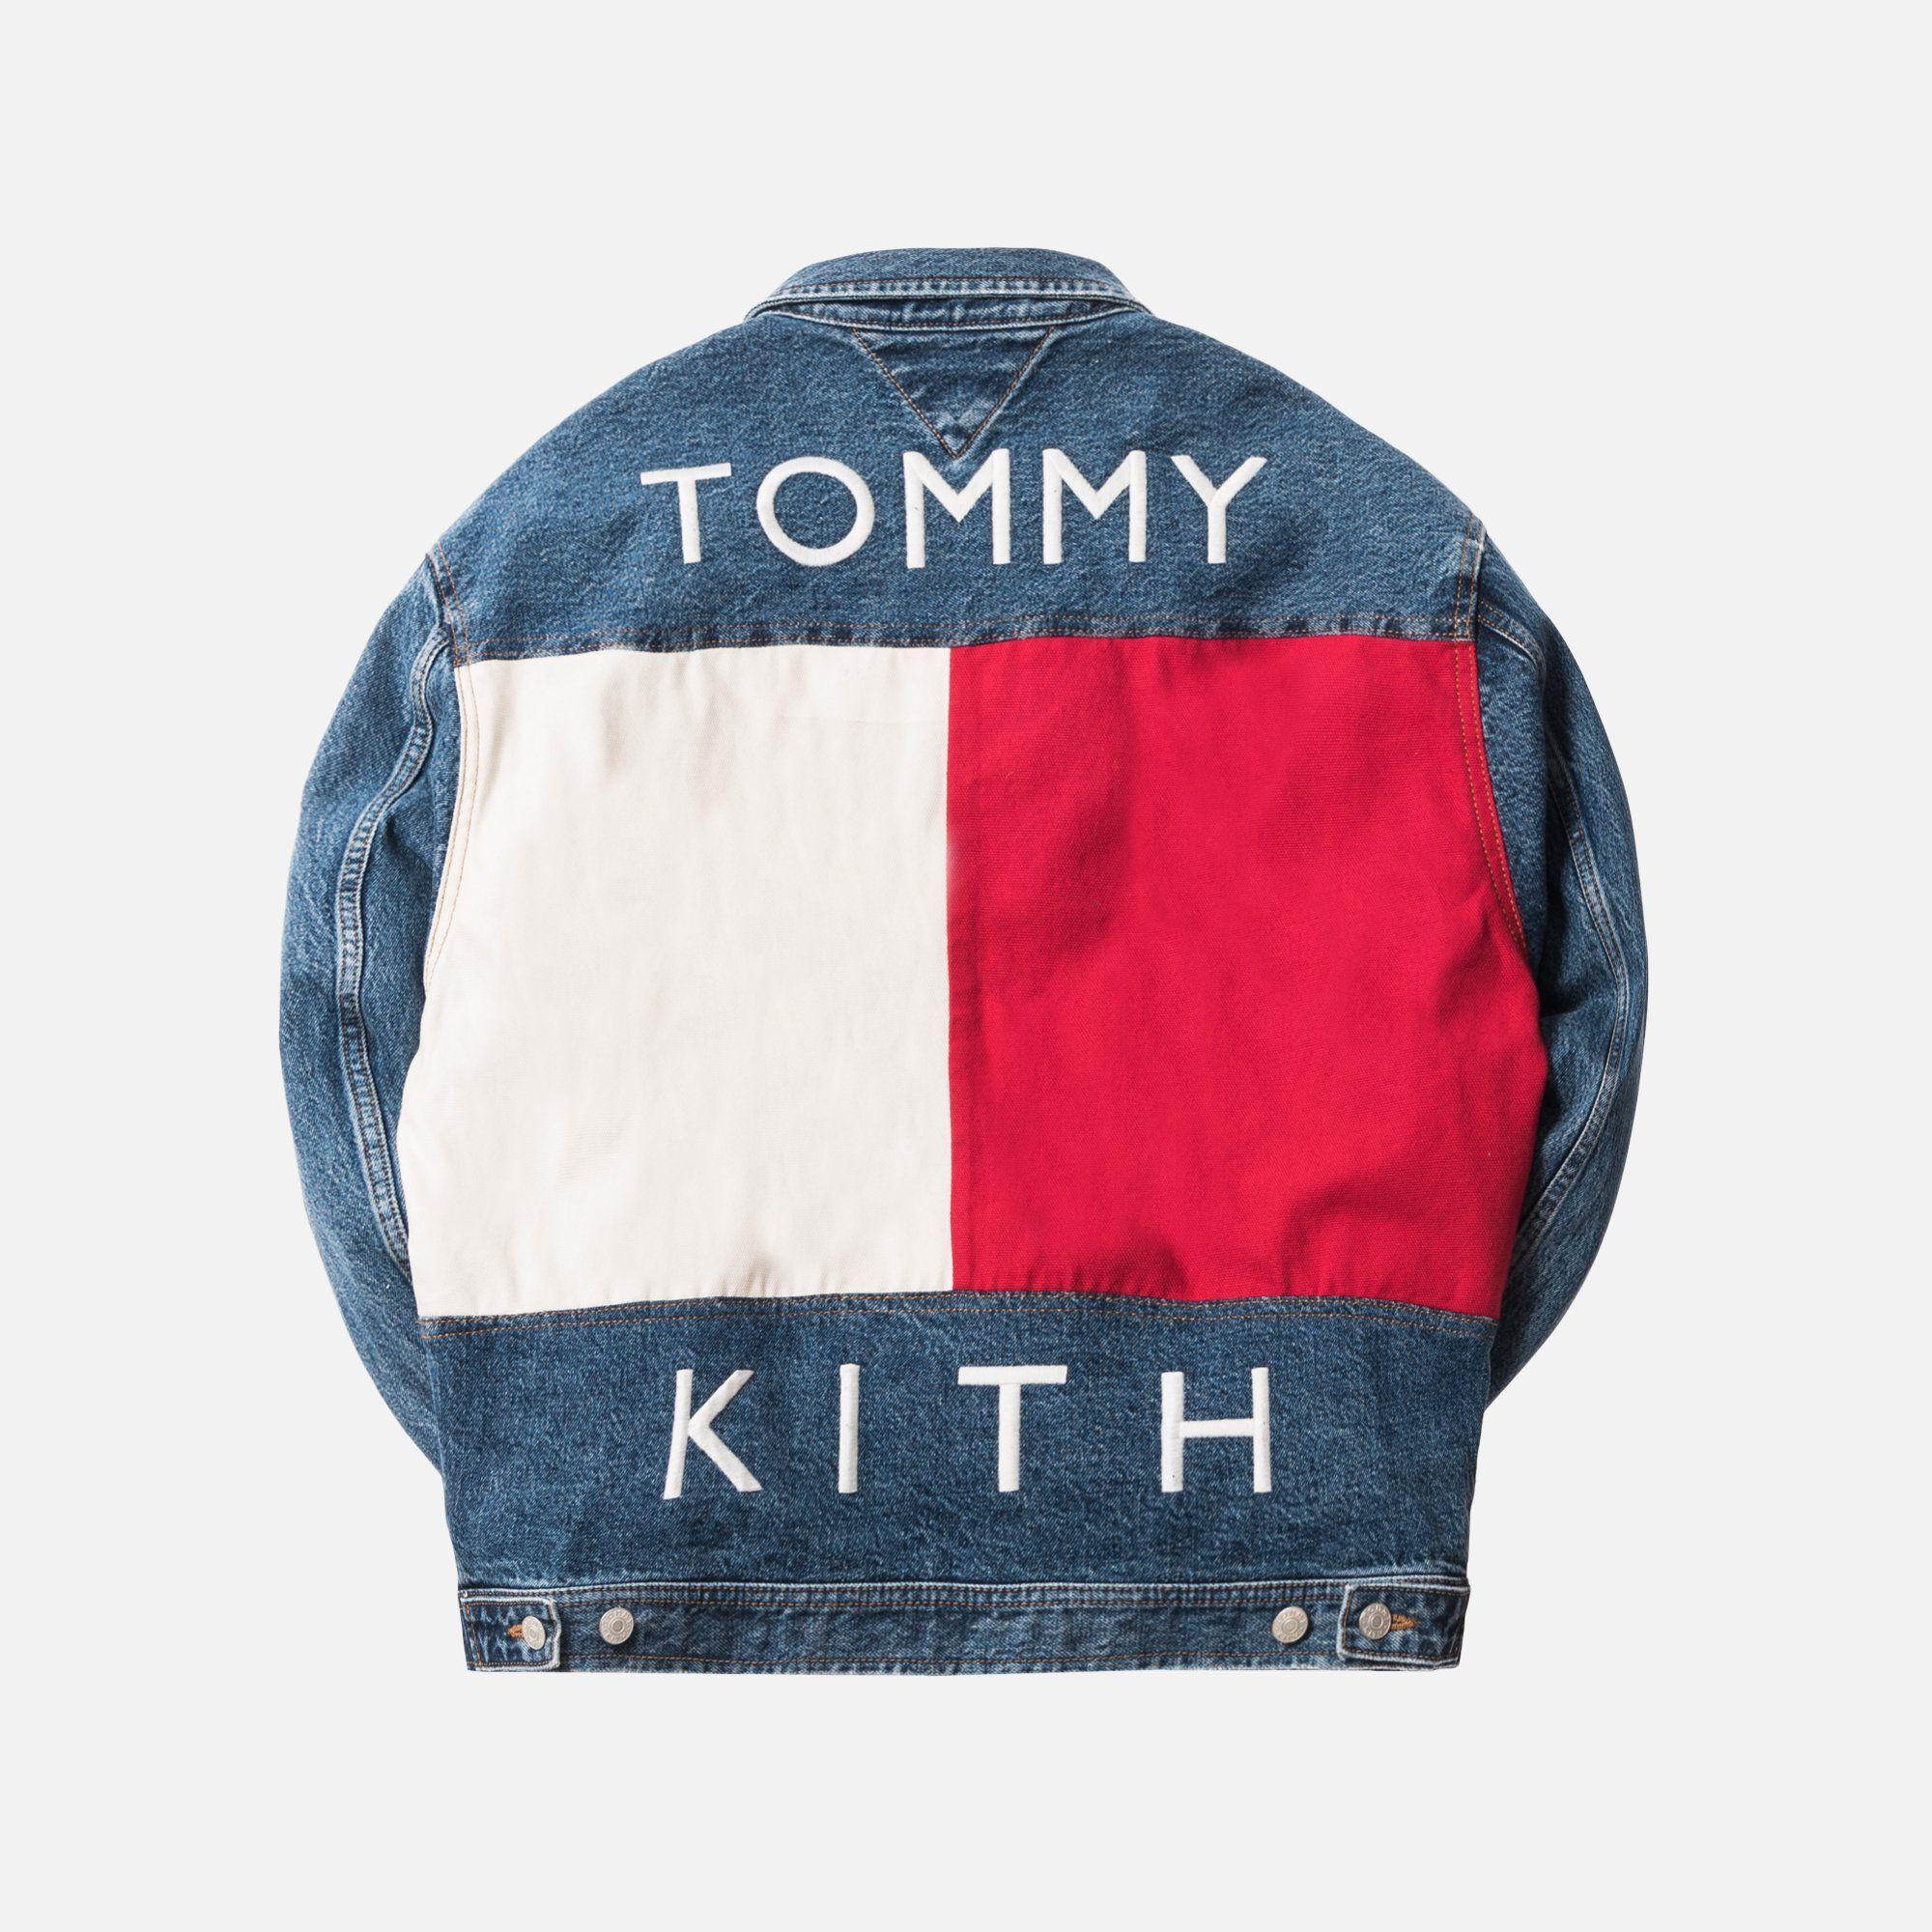 Kith x Tommy Hilfiger Denim Trucker Jacket Vintage Blue